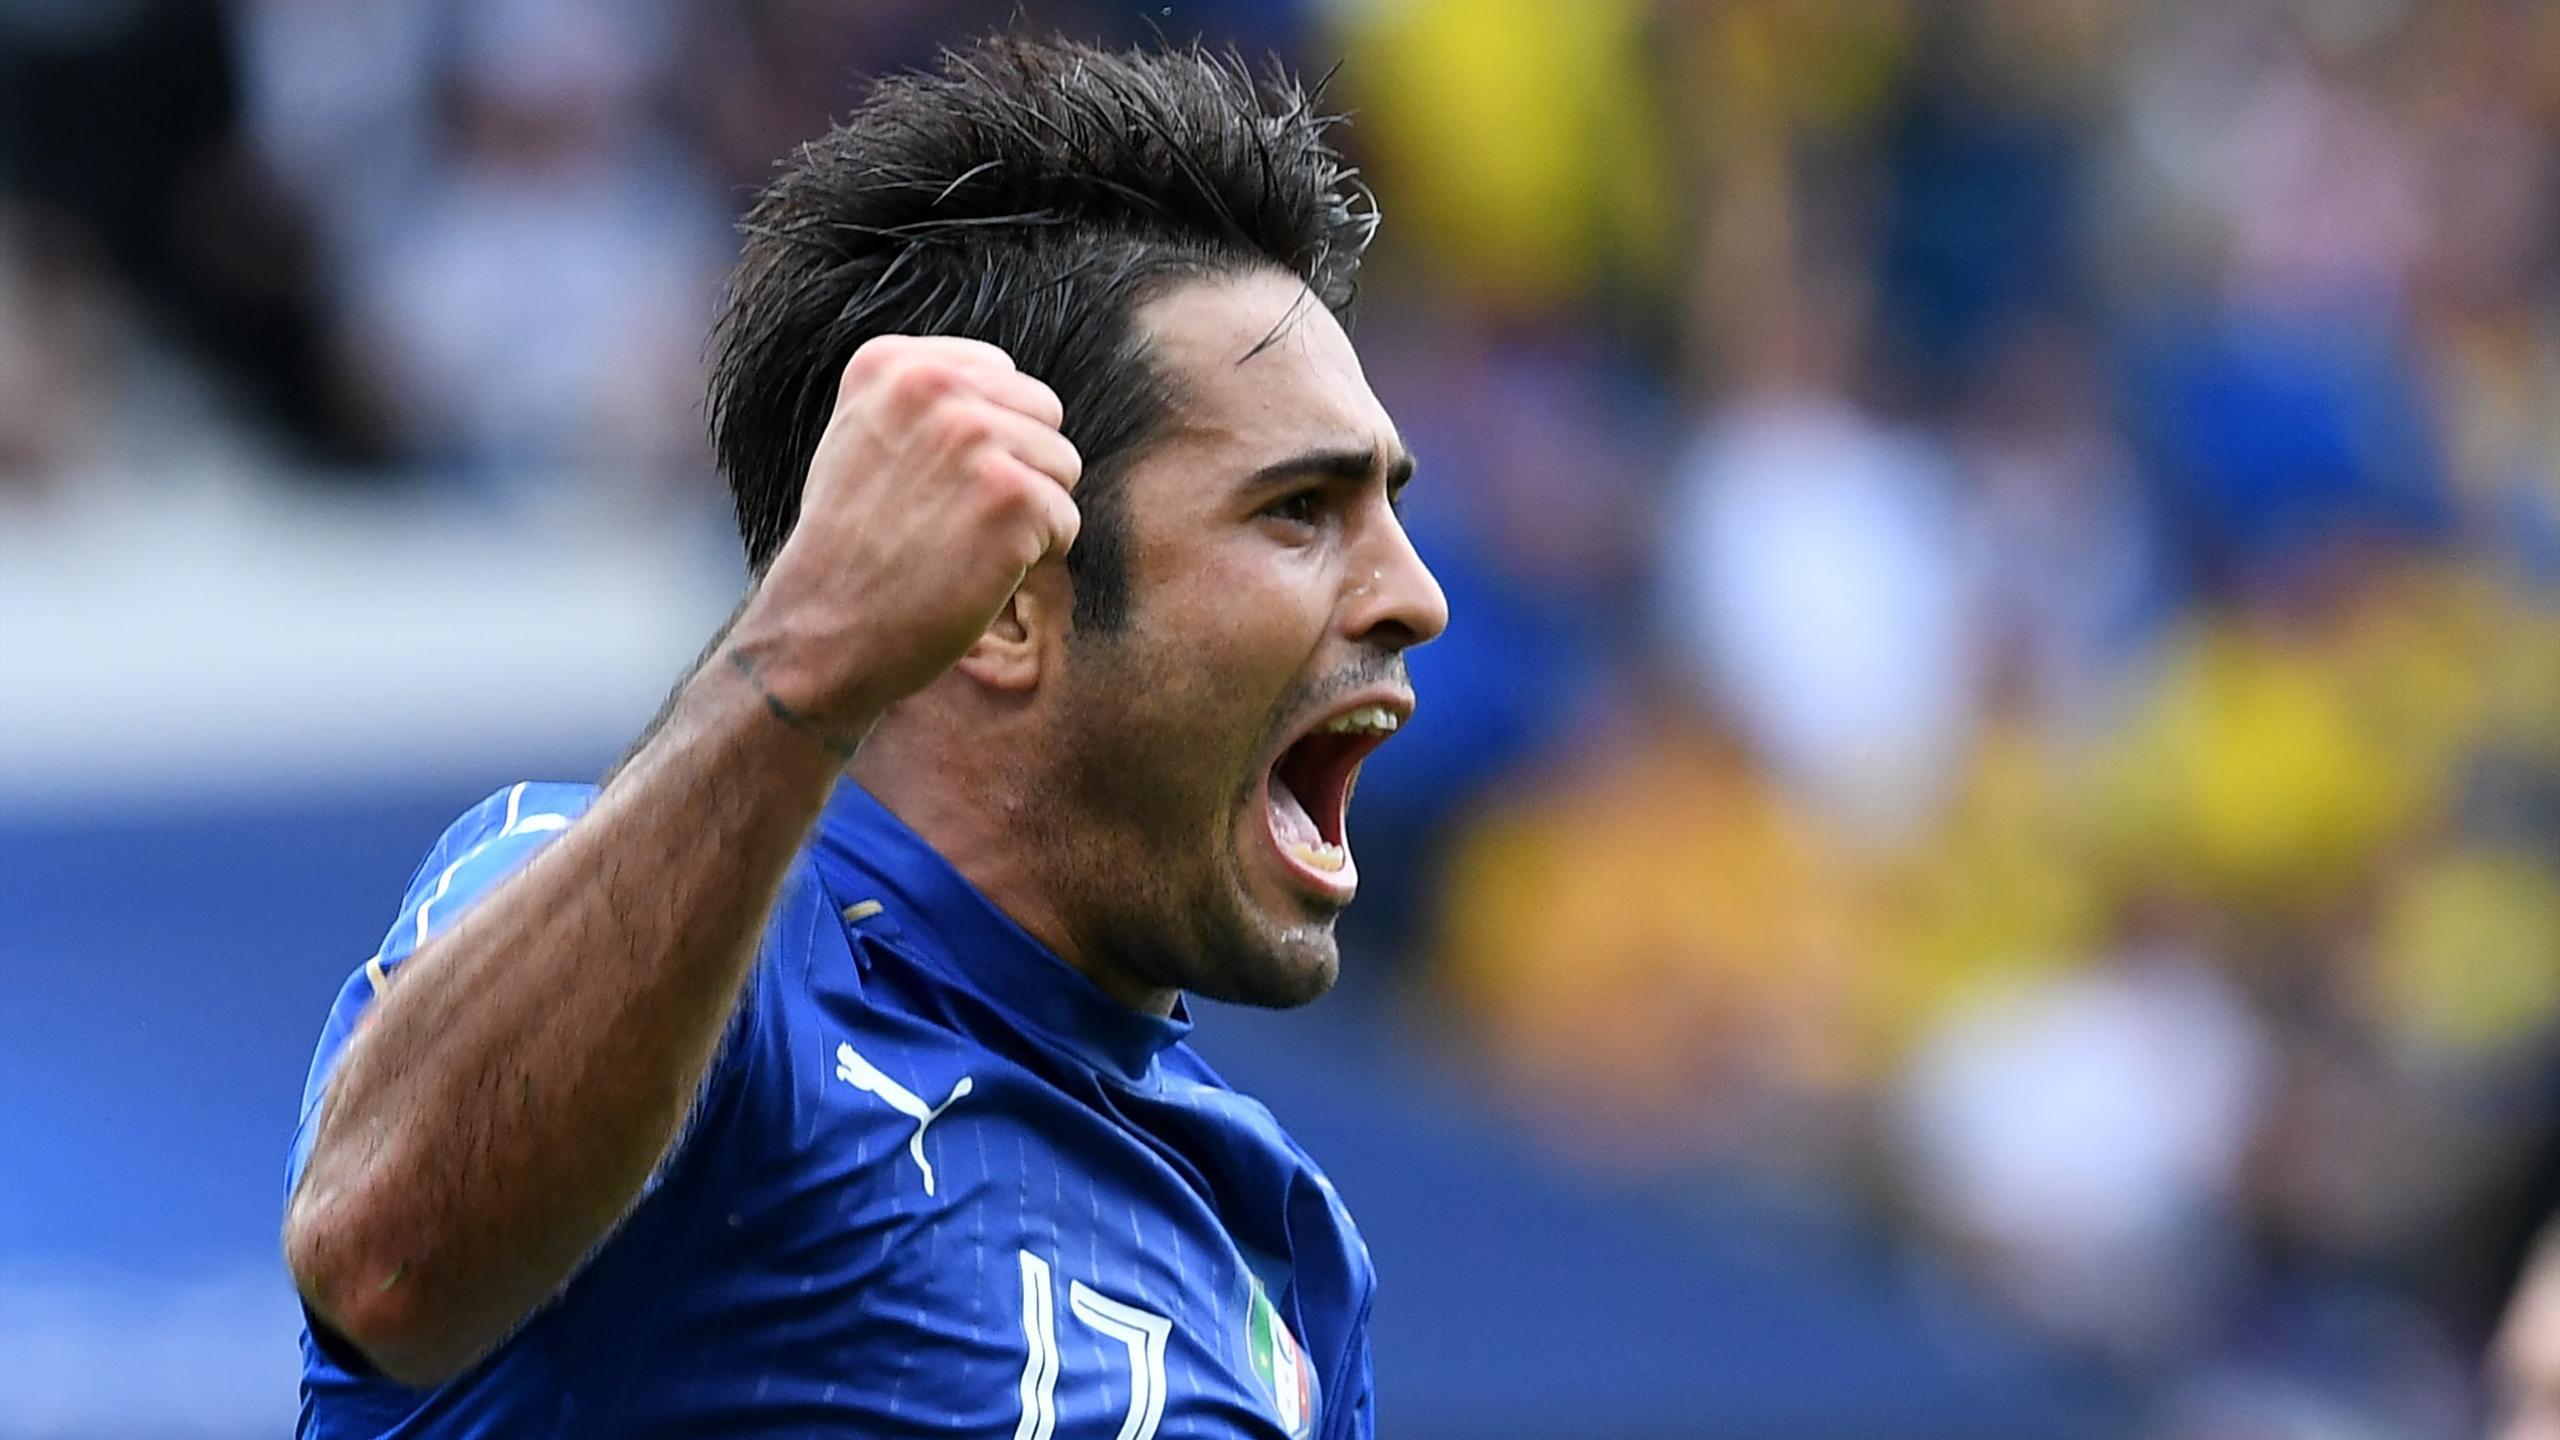 Eder - Italy v Sweden - Euro 2016